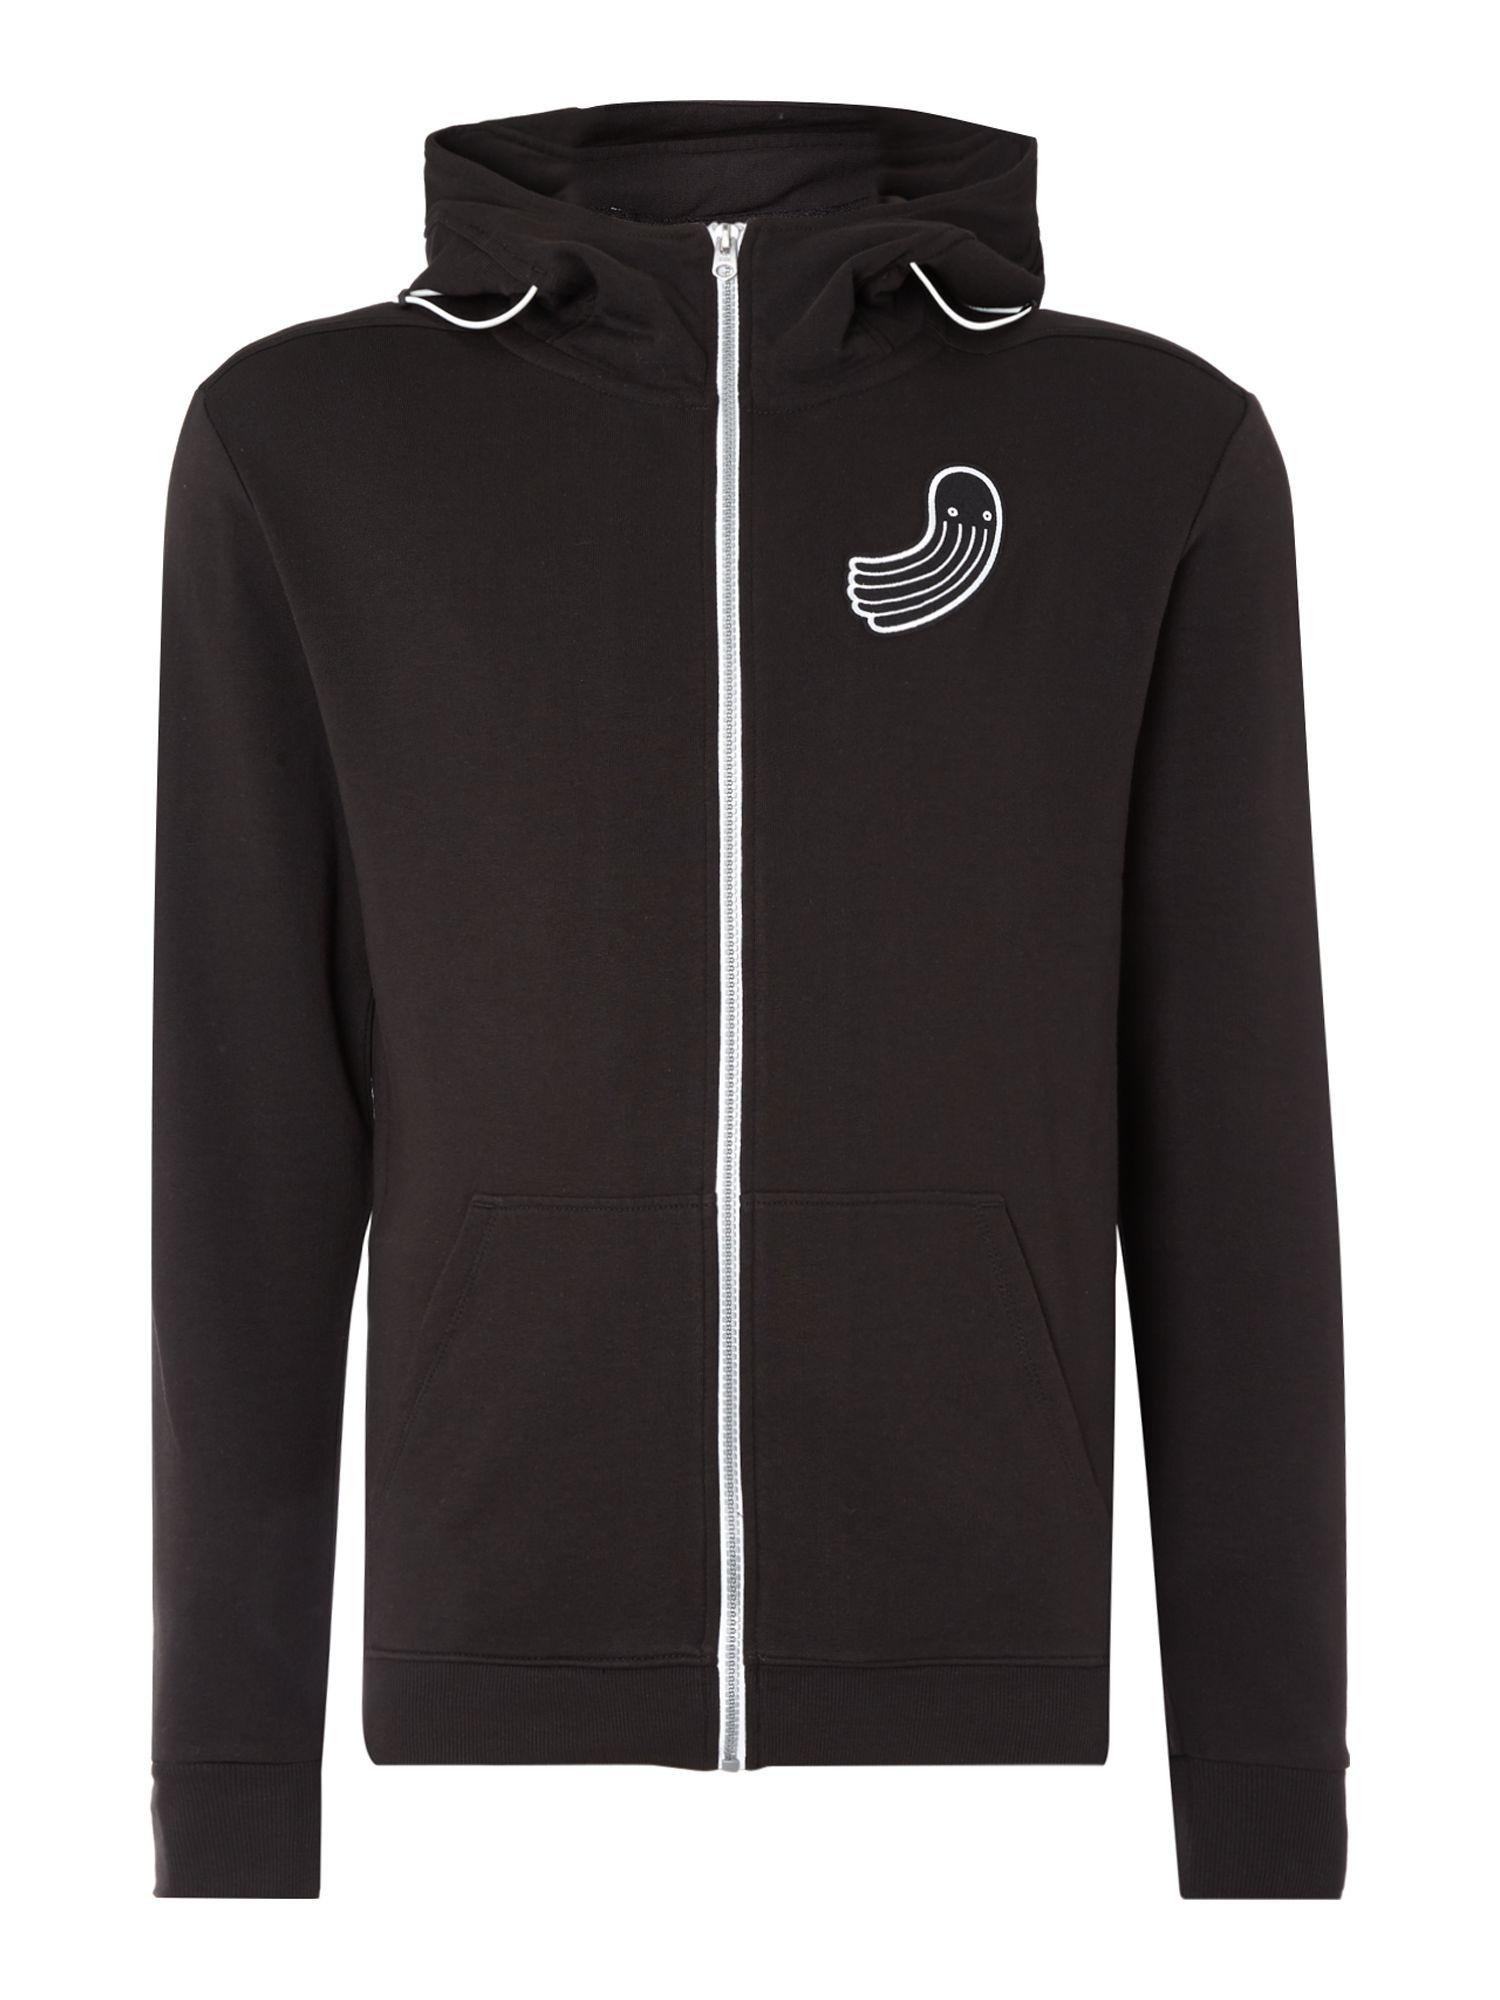 g star raw pharrell williams zip up logo hoodie in black. Black Bedroom Furniture Sets. Home Design Ideas